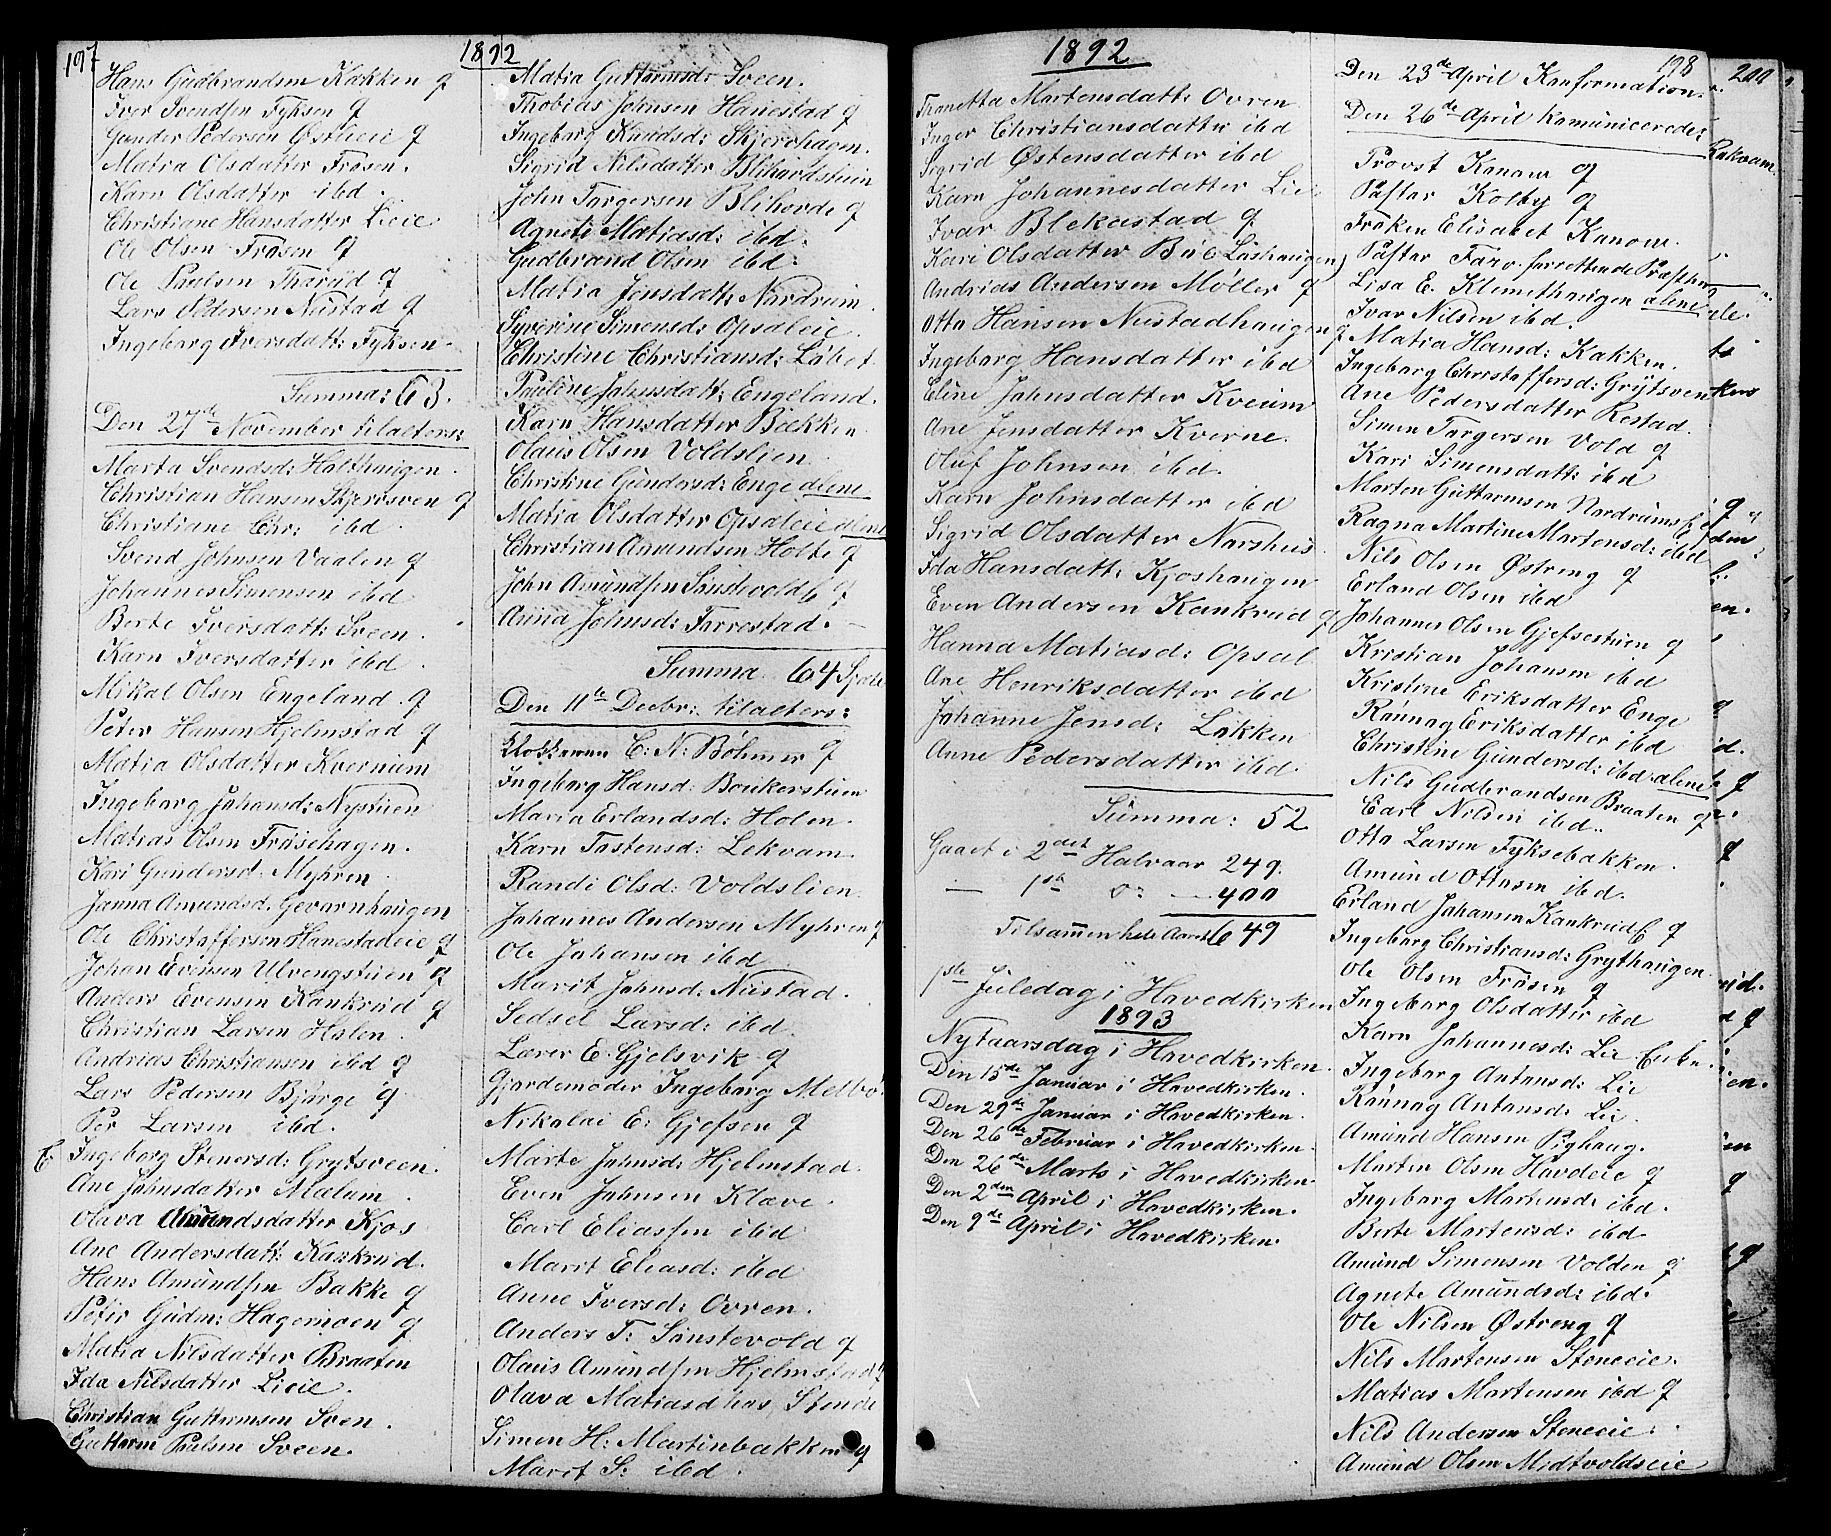 SAH, Østre Gausdal prestekontor, Klokkerbok nr. 1, 1863-1893, s. 197-198